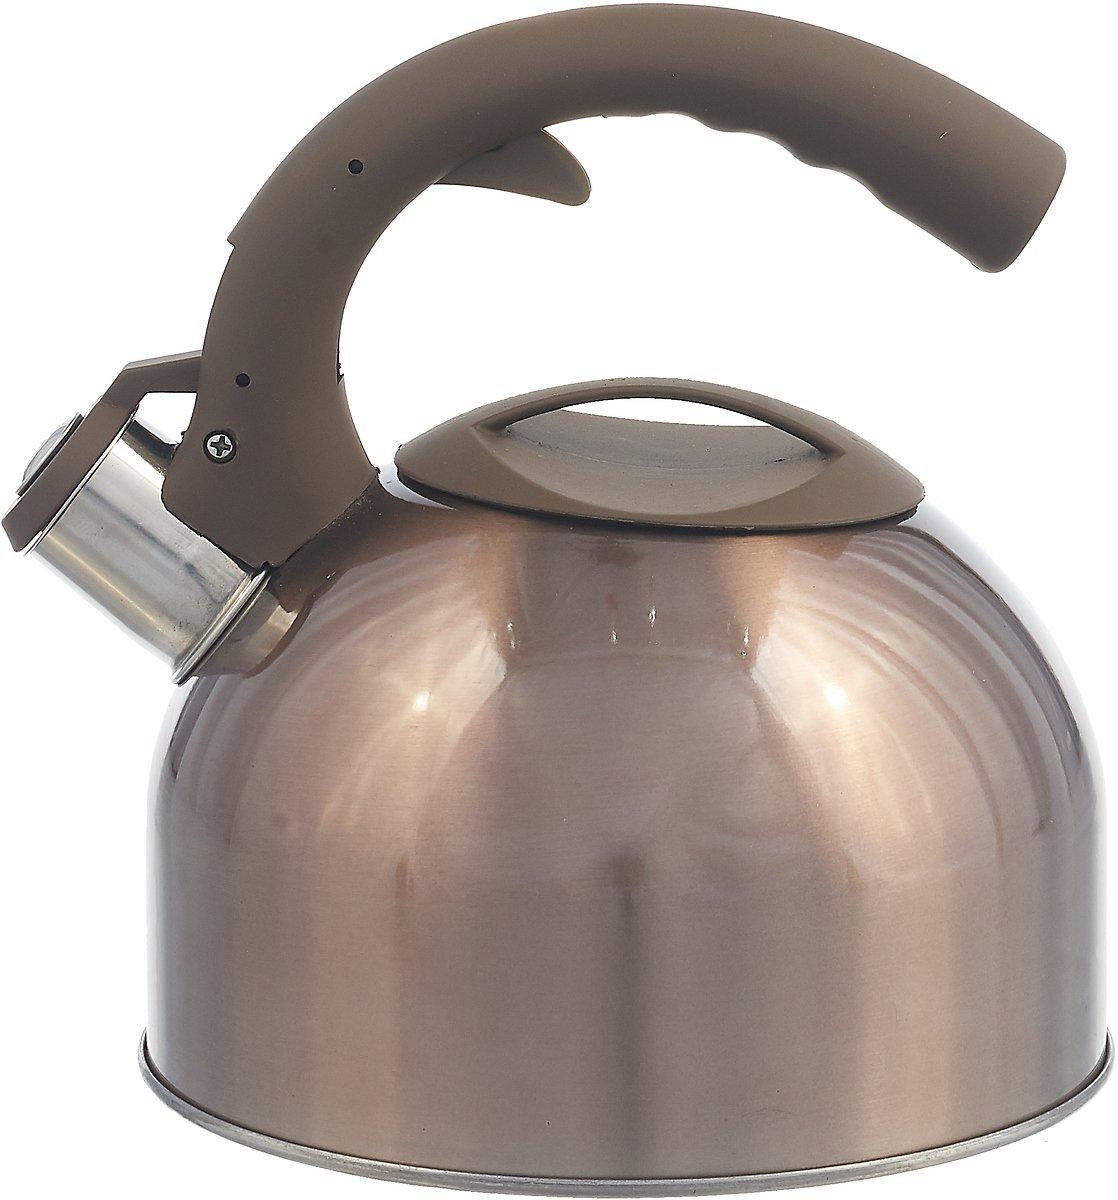 Чайник 2,5 л Cuprum Hitt со свистком